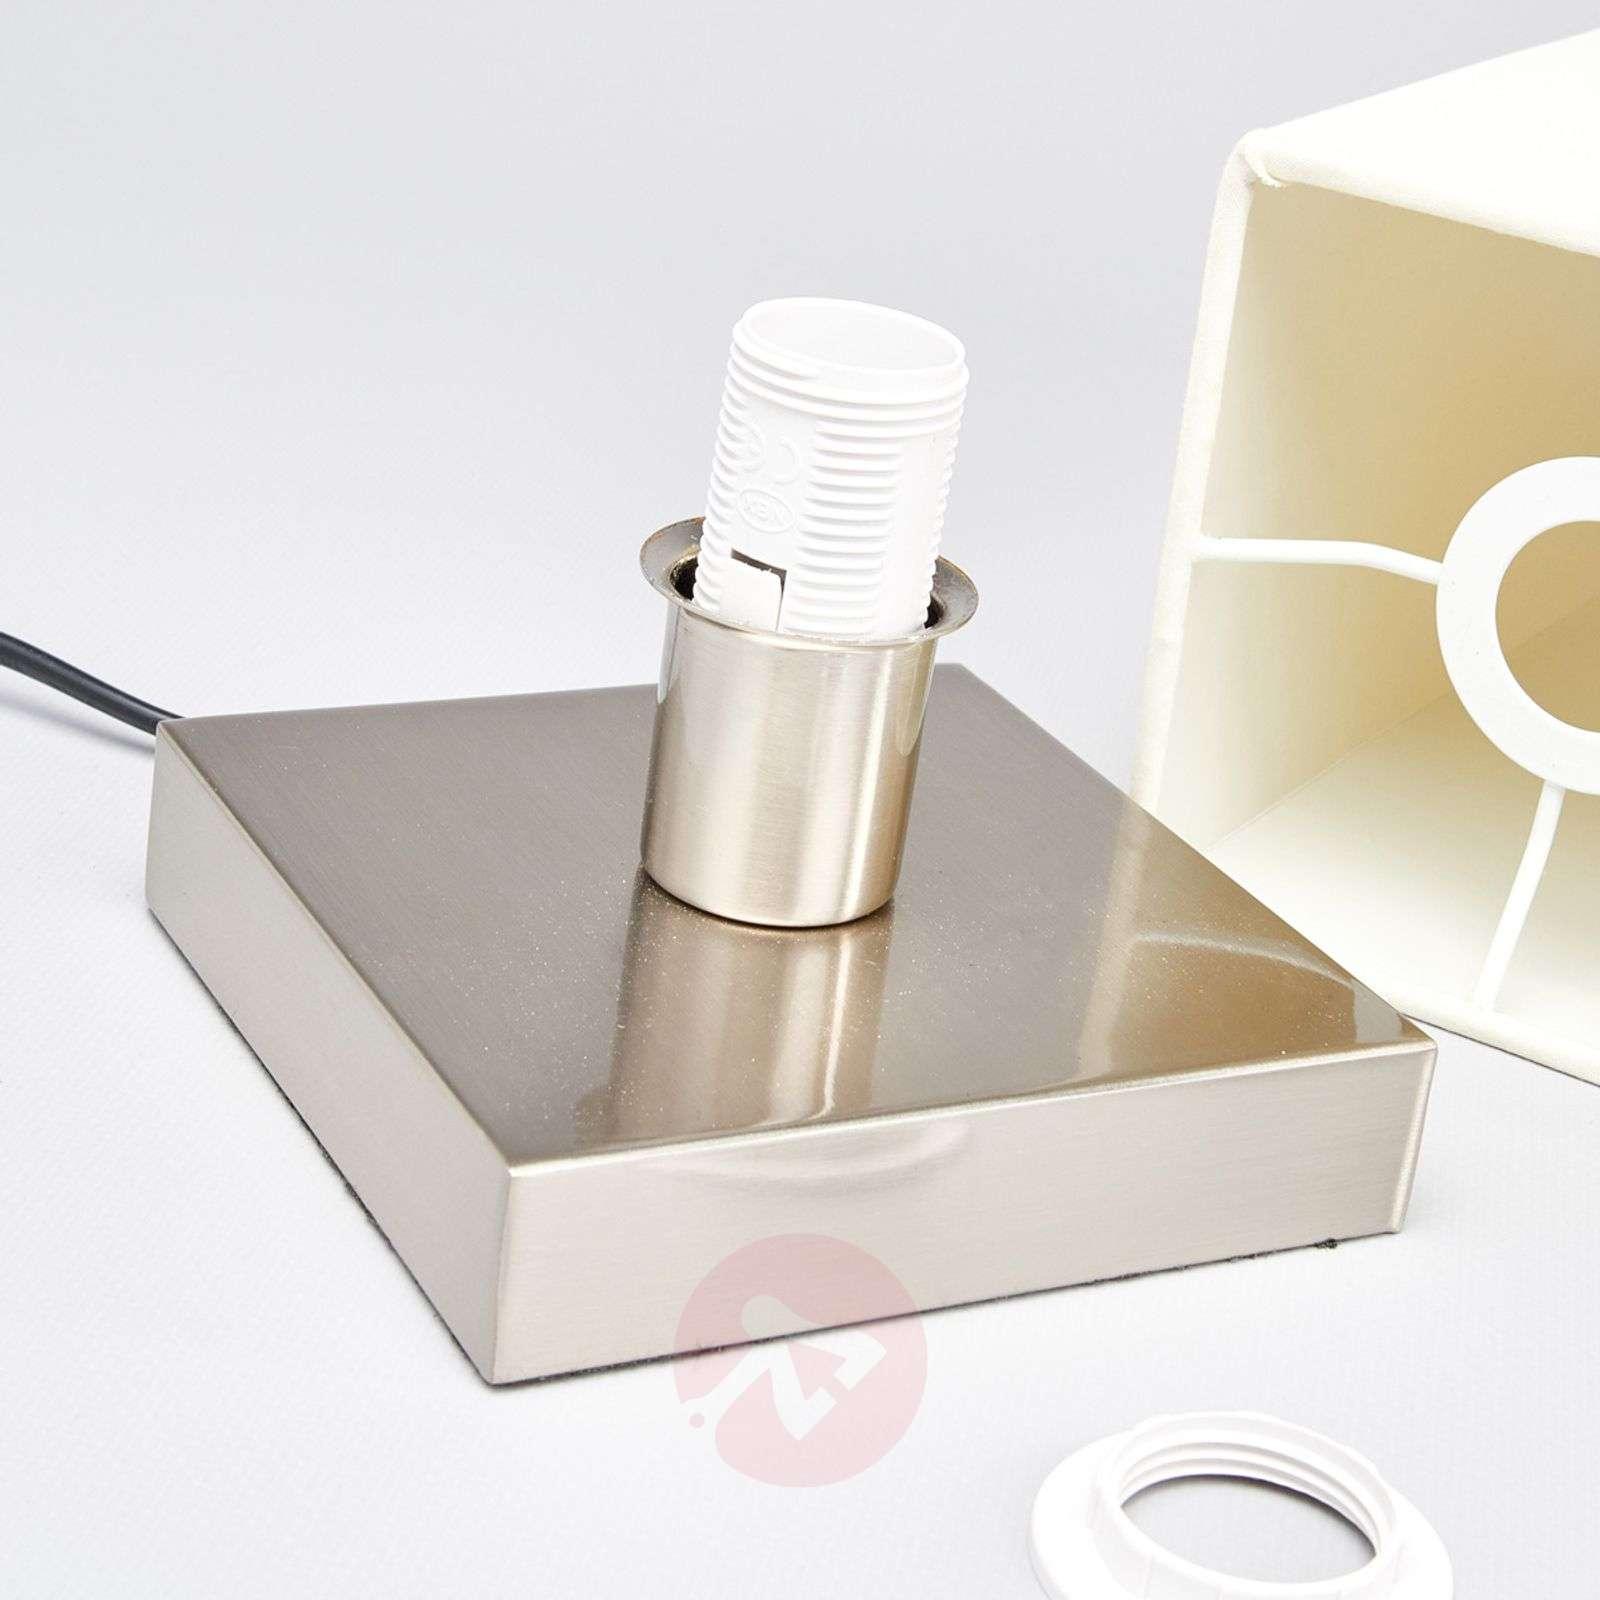 Martje white table light with E14 LED lamp-9620067-01